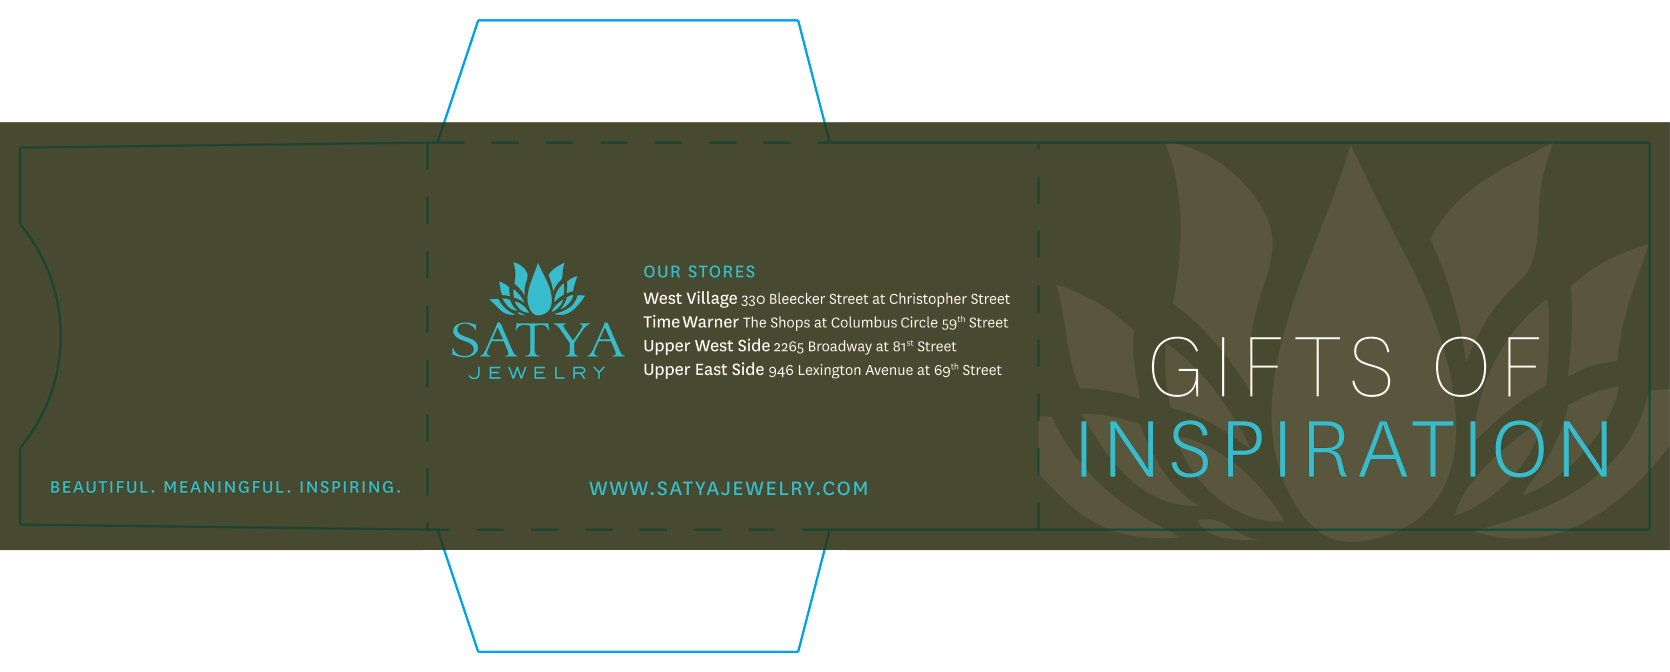 Satya Jewelry Gift Card Carrier